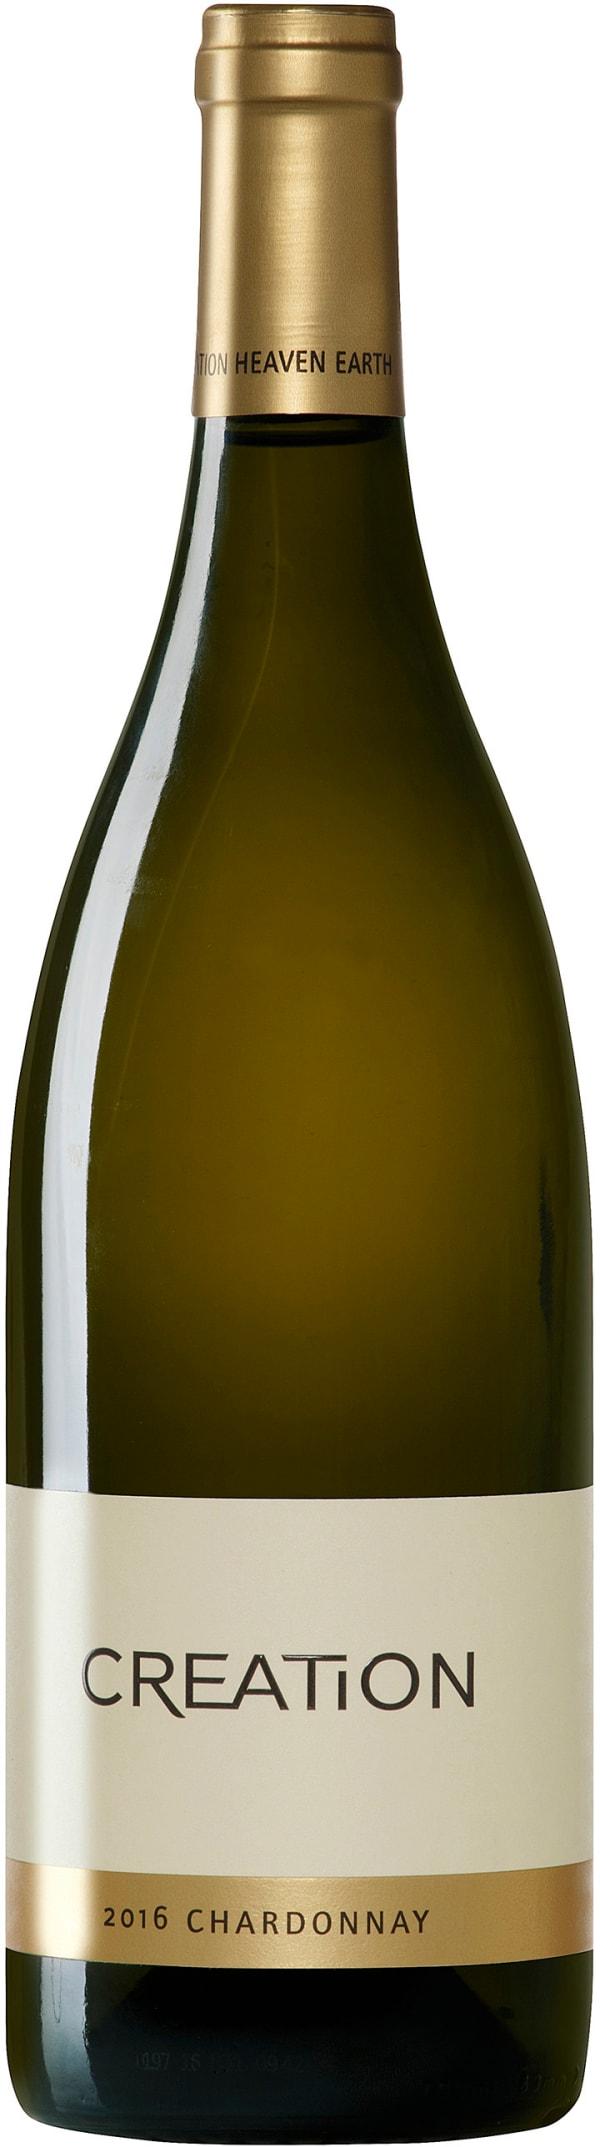 Creation Chardonnay 2016